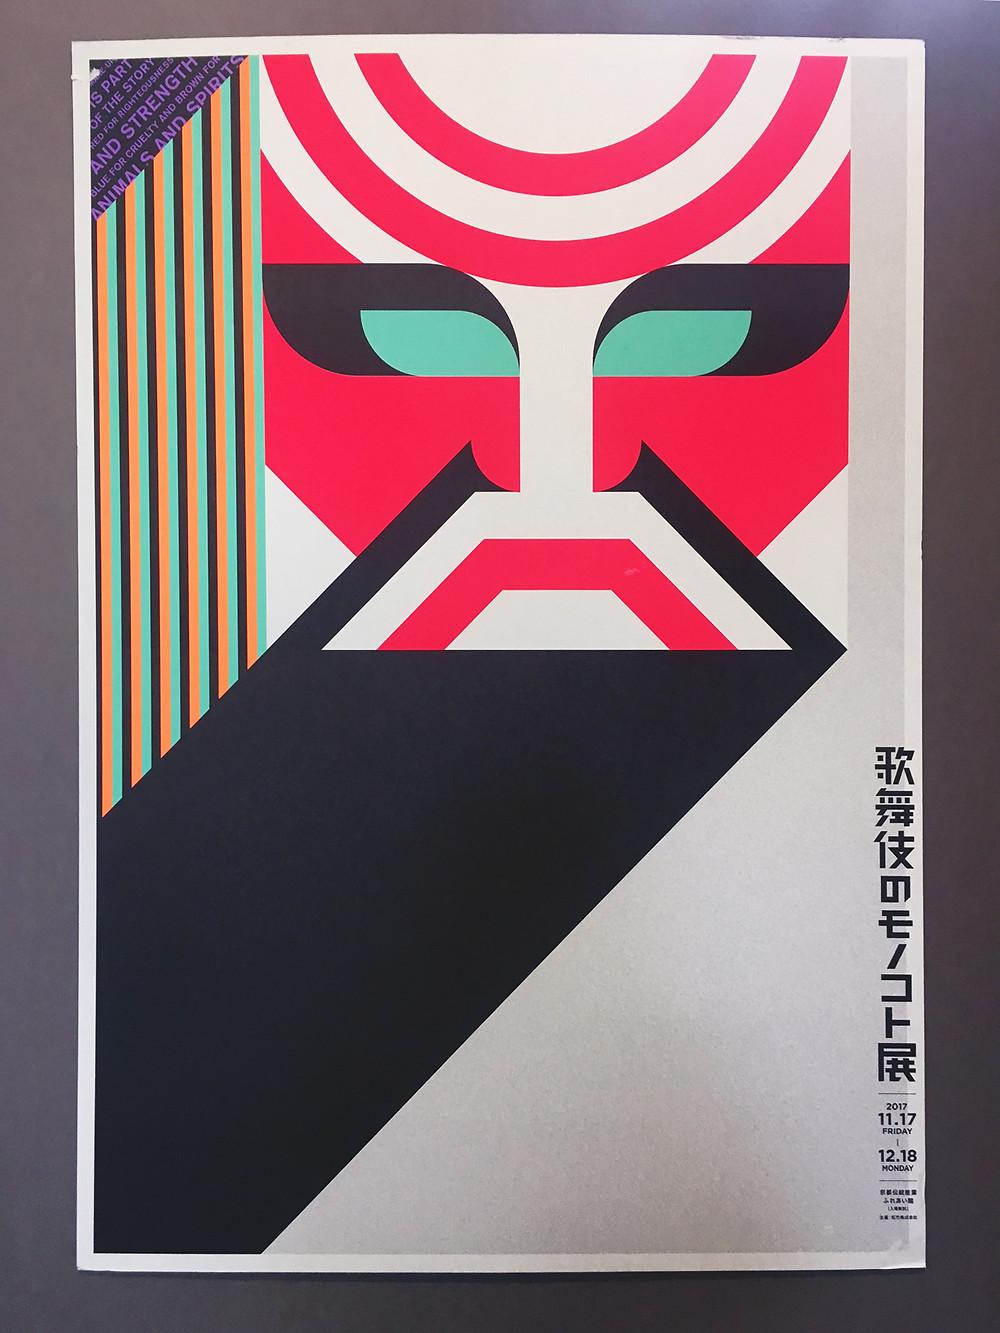 Eating Kabuki with your fingers, Dentsu for Sochiku Minami-za D&AD 2018